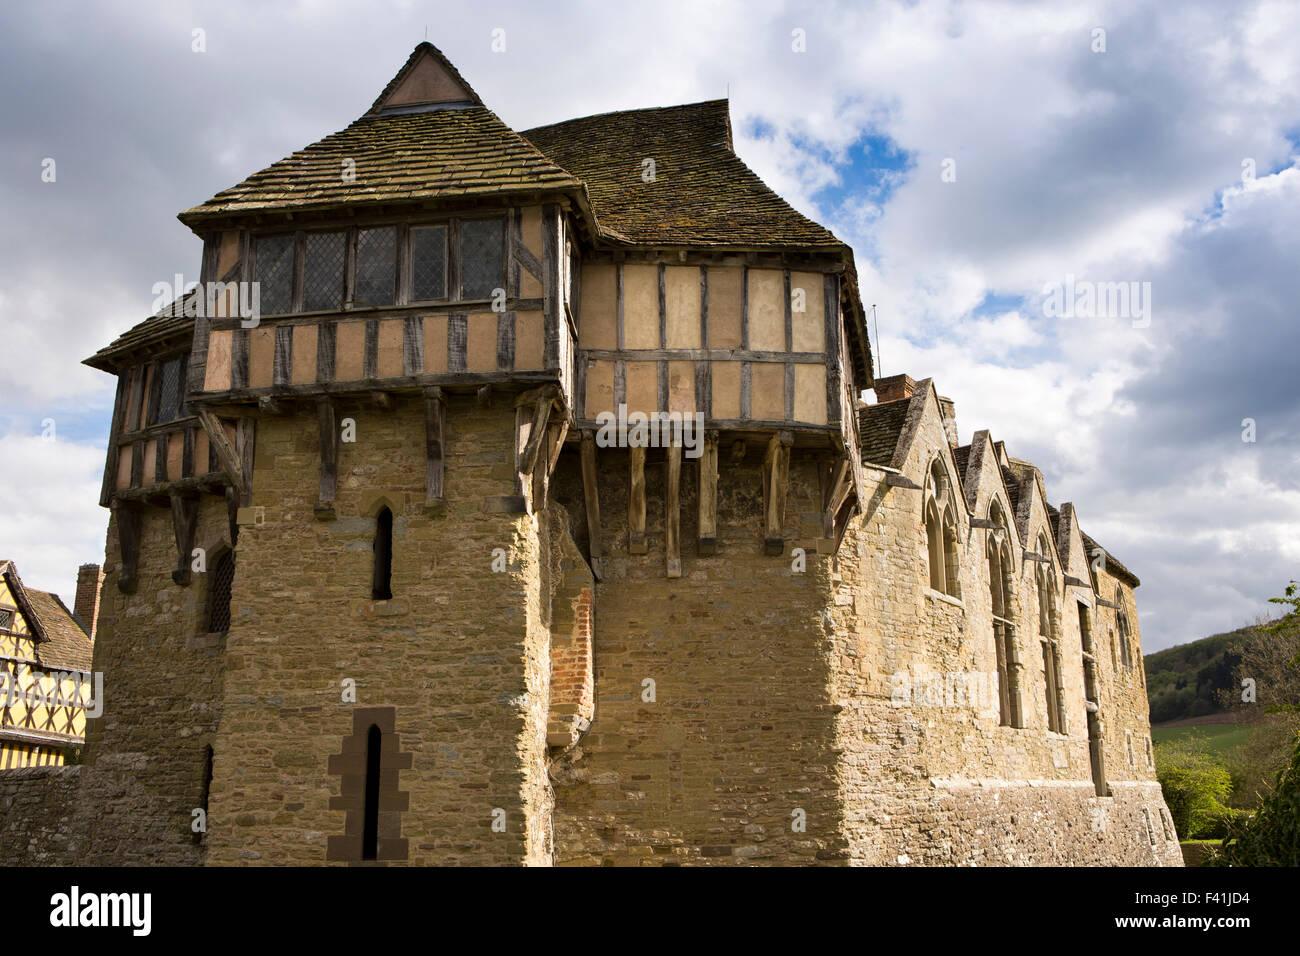 Reino Unido, Inglaterra, Shropshire, Craven Arms, Stokesay Castle Torre Norte Foto de stock